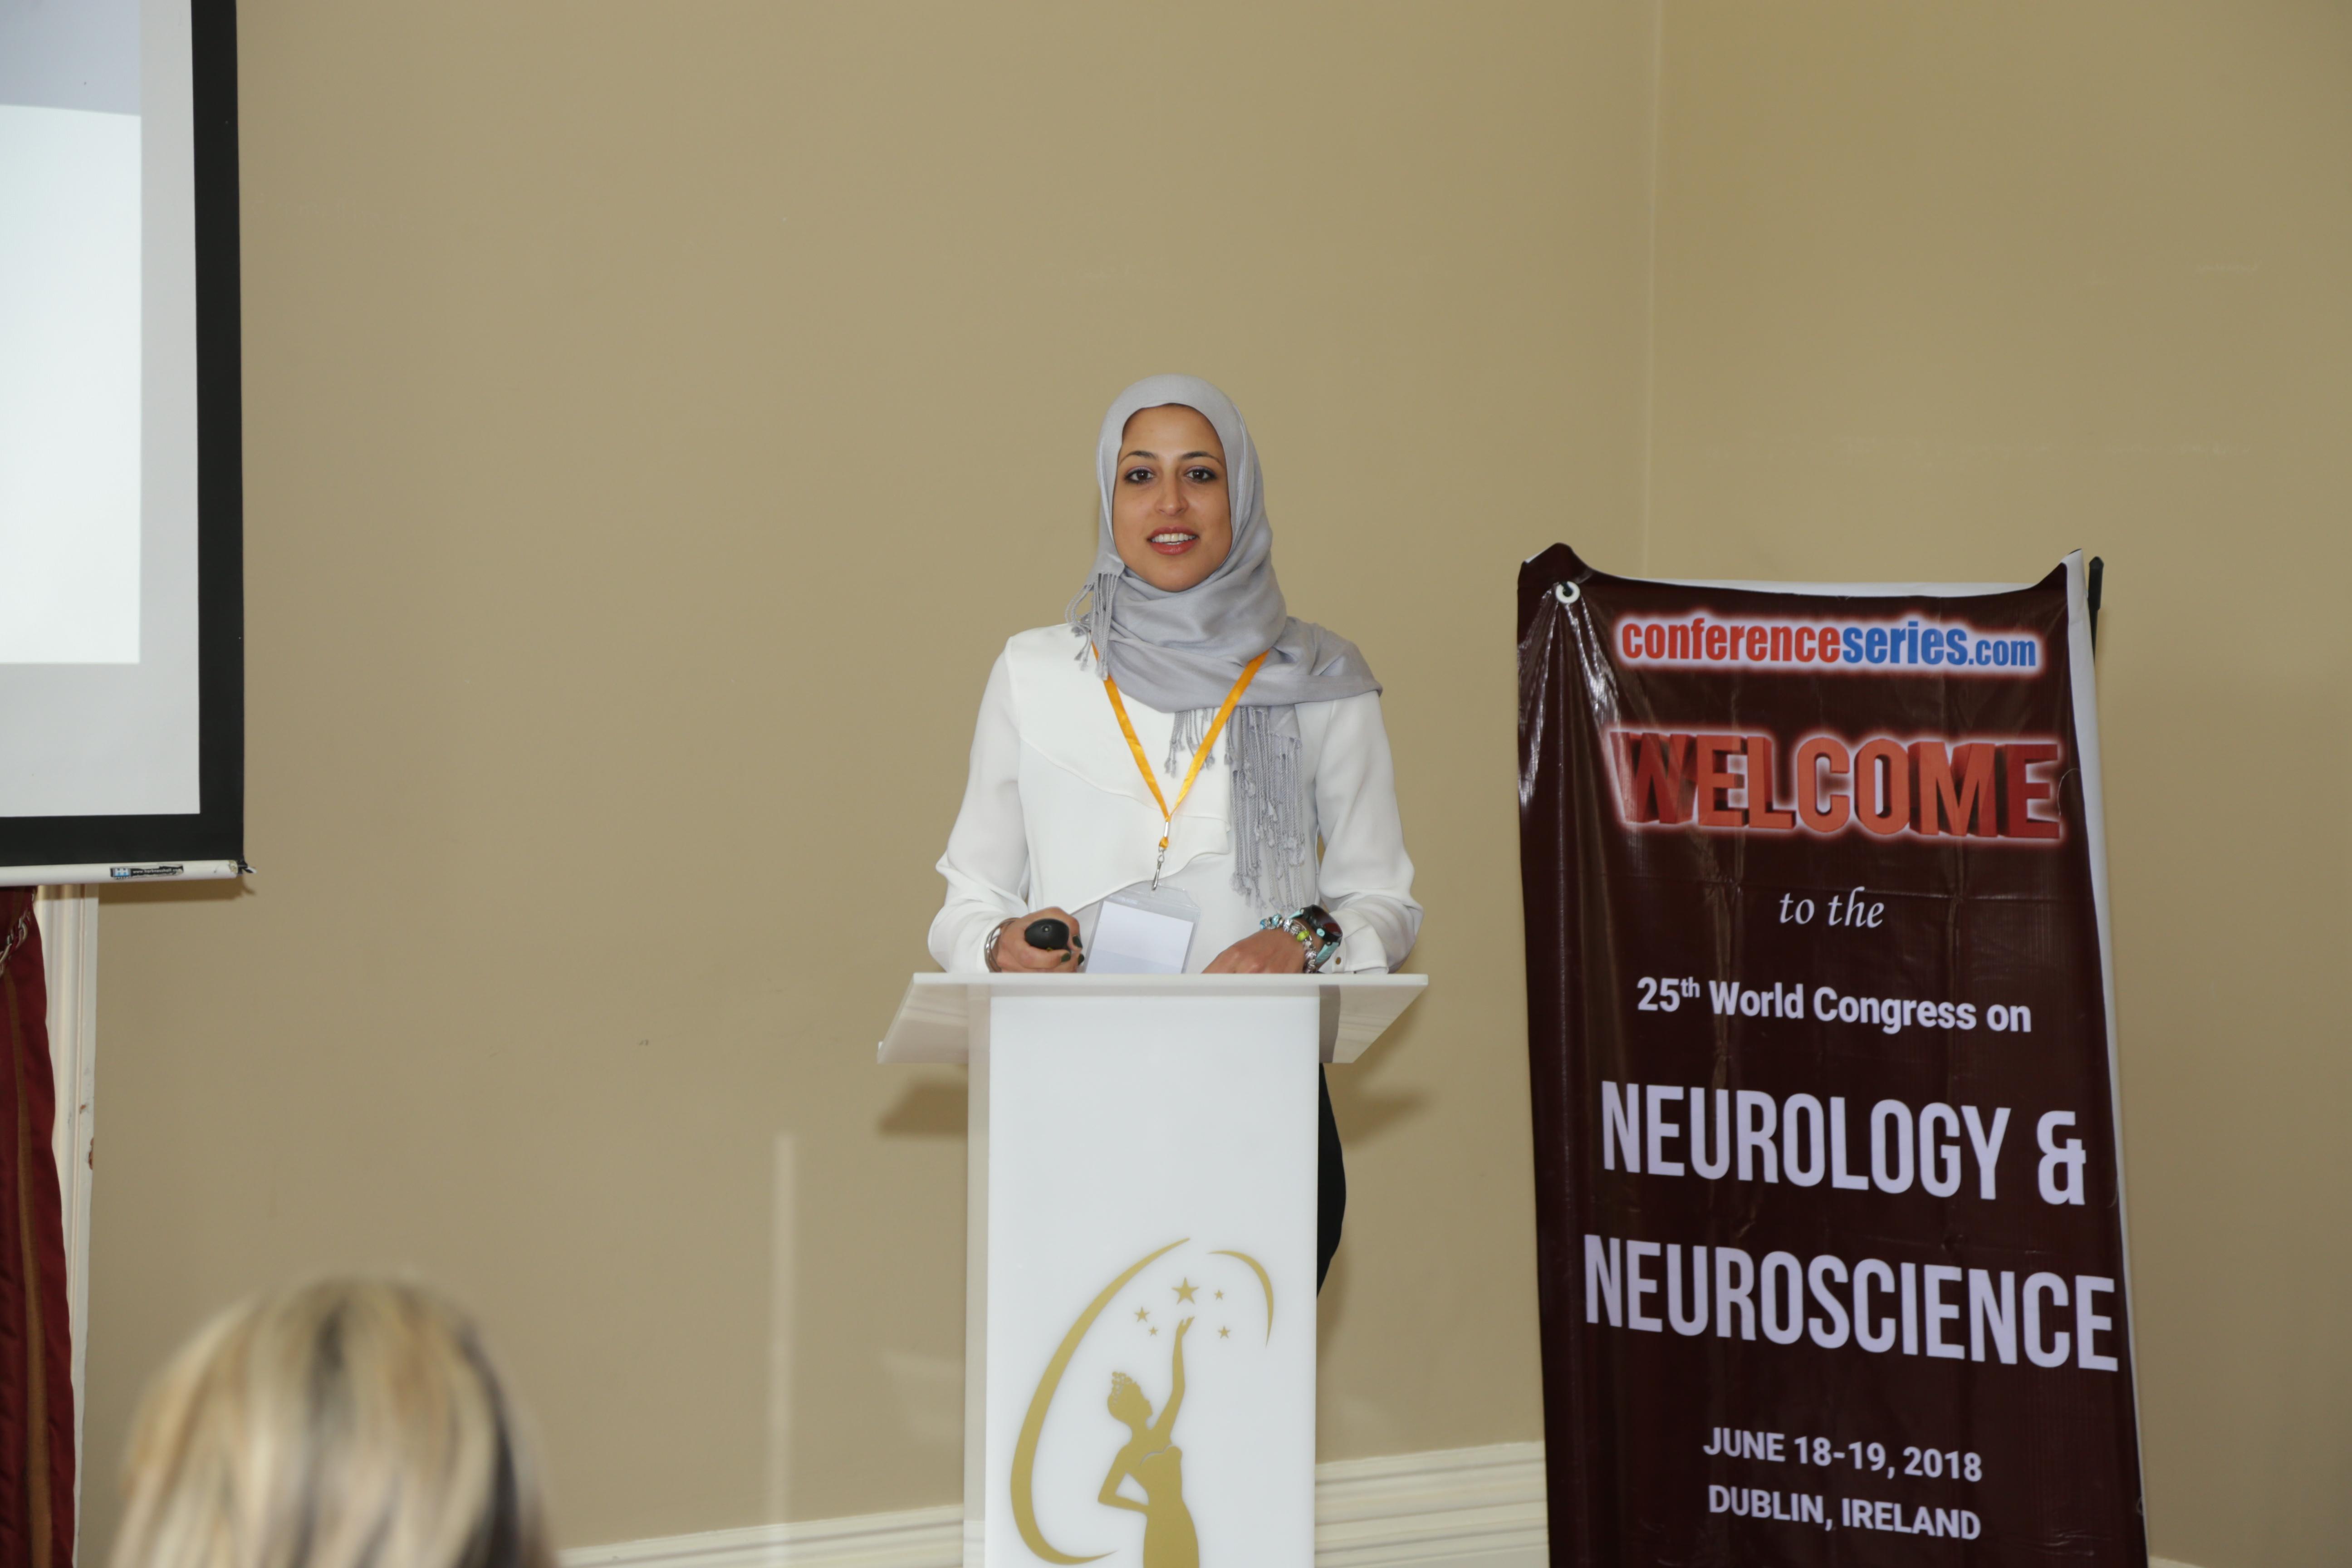 Neuroscience Congress 2019 International Conference Keynote Speaker Hebah Hefzy photo